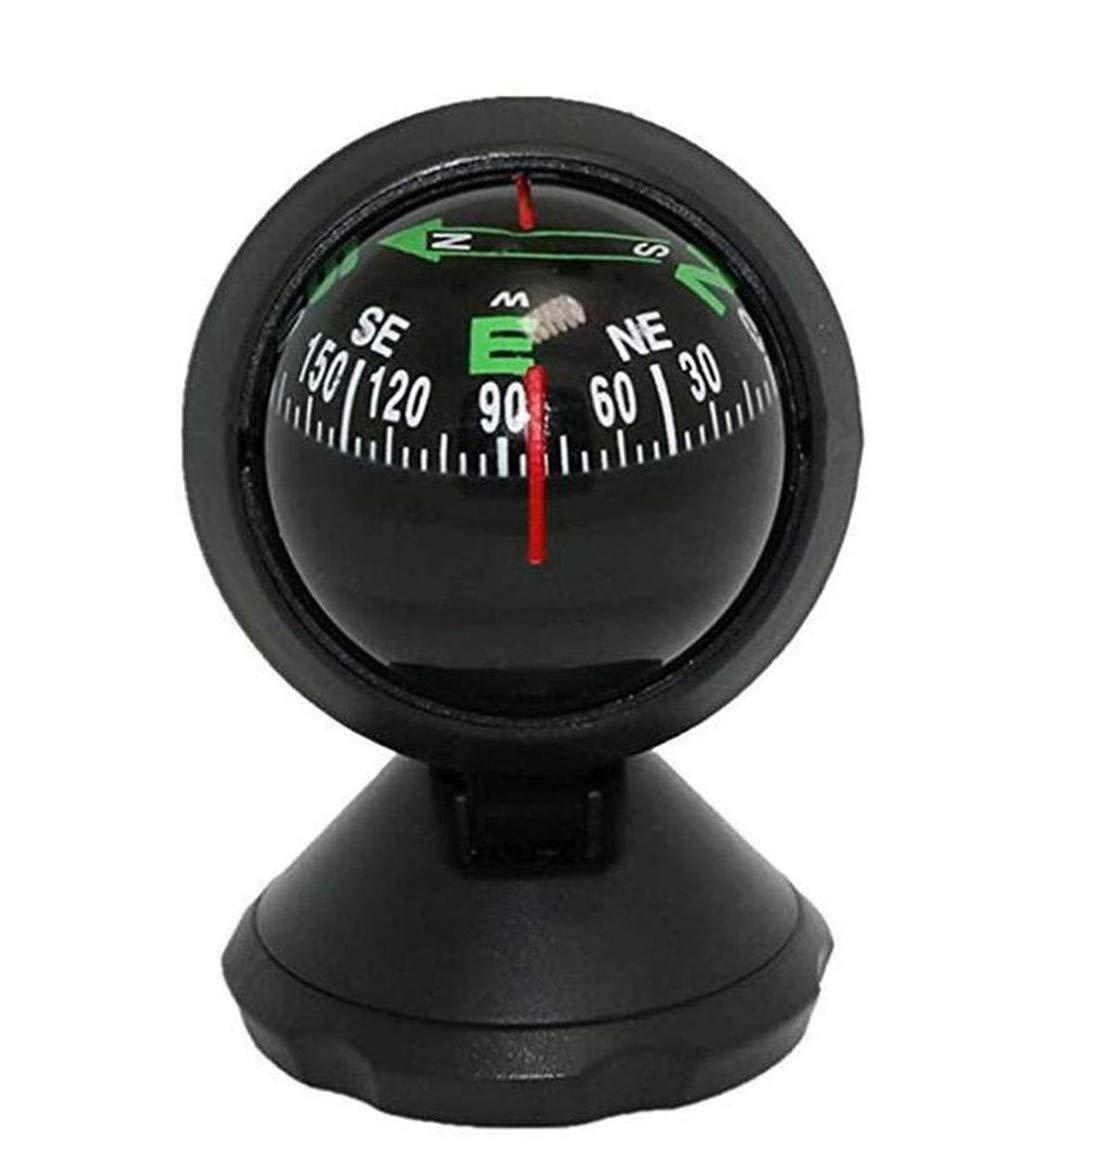 LOSOUL Compass Marine Navigation Ball Boat Car Truck Vehicle Dashboard Adjustable